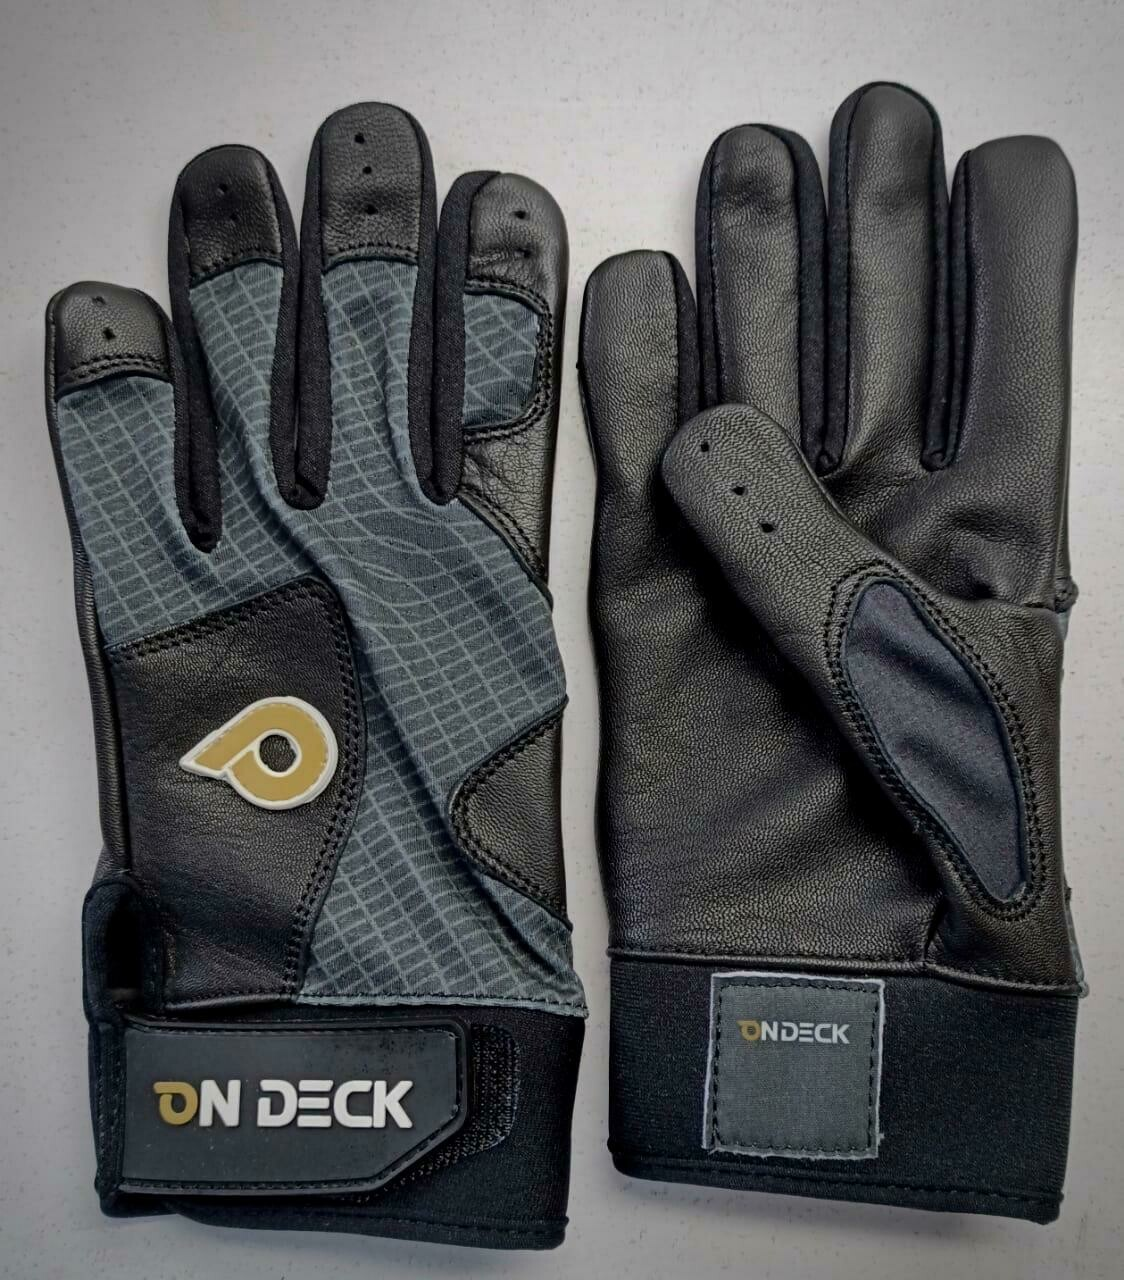 Series II Batting Gloves (Midnight Black)